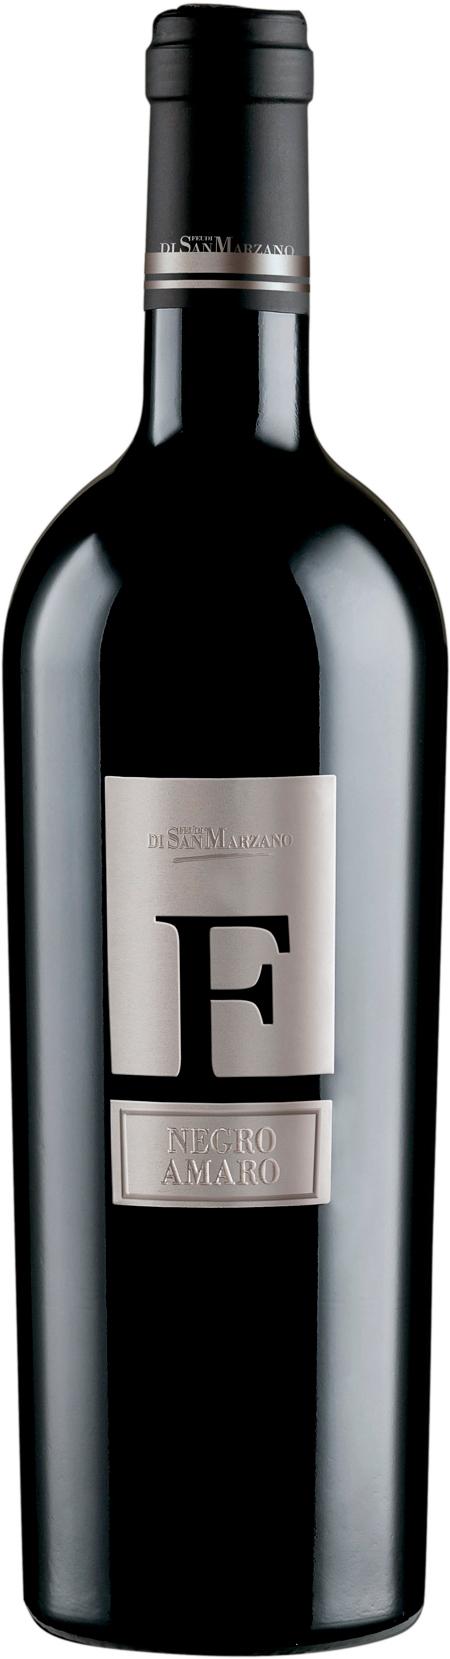 San Marzano Negroamaro (F) 2017 Magnum